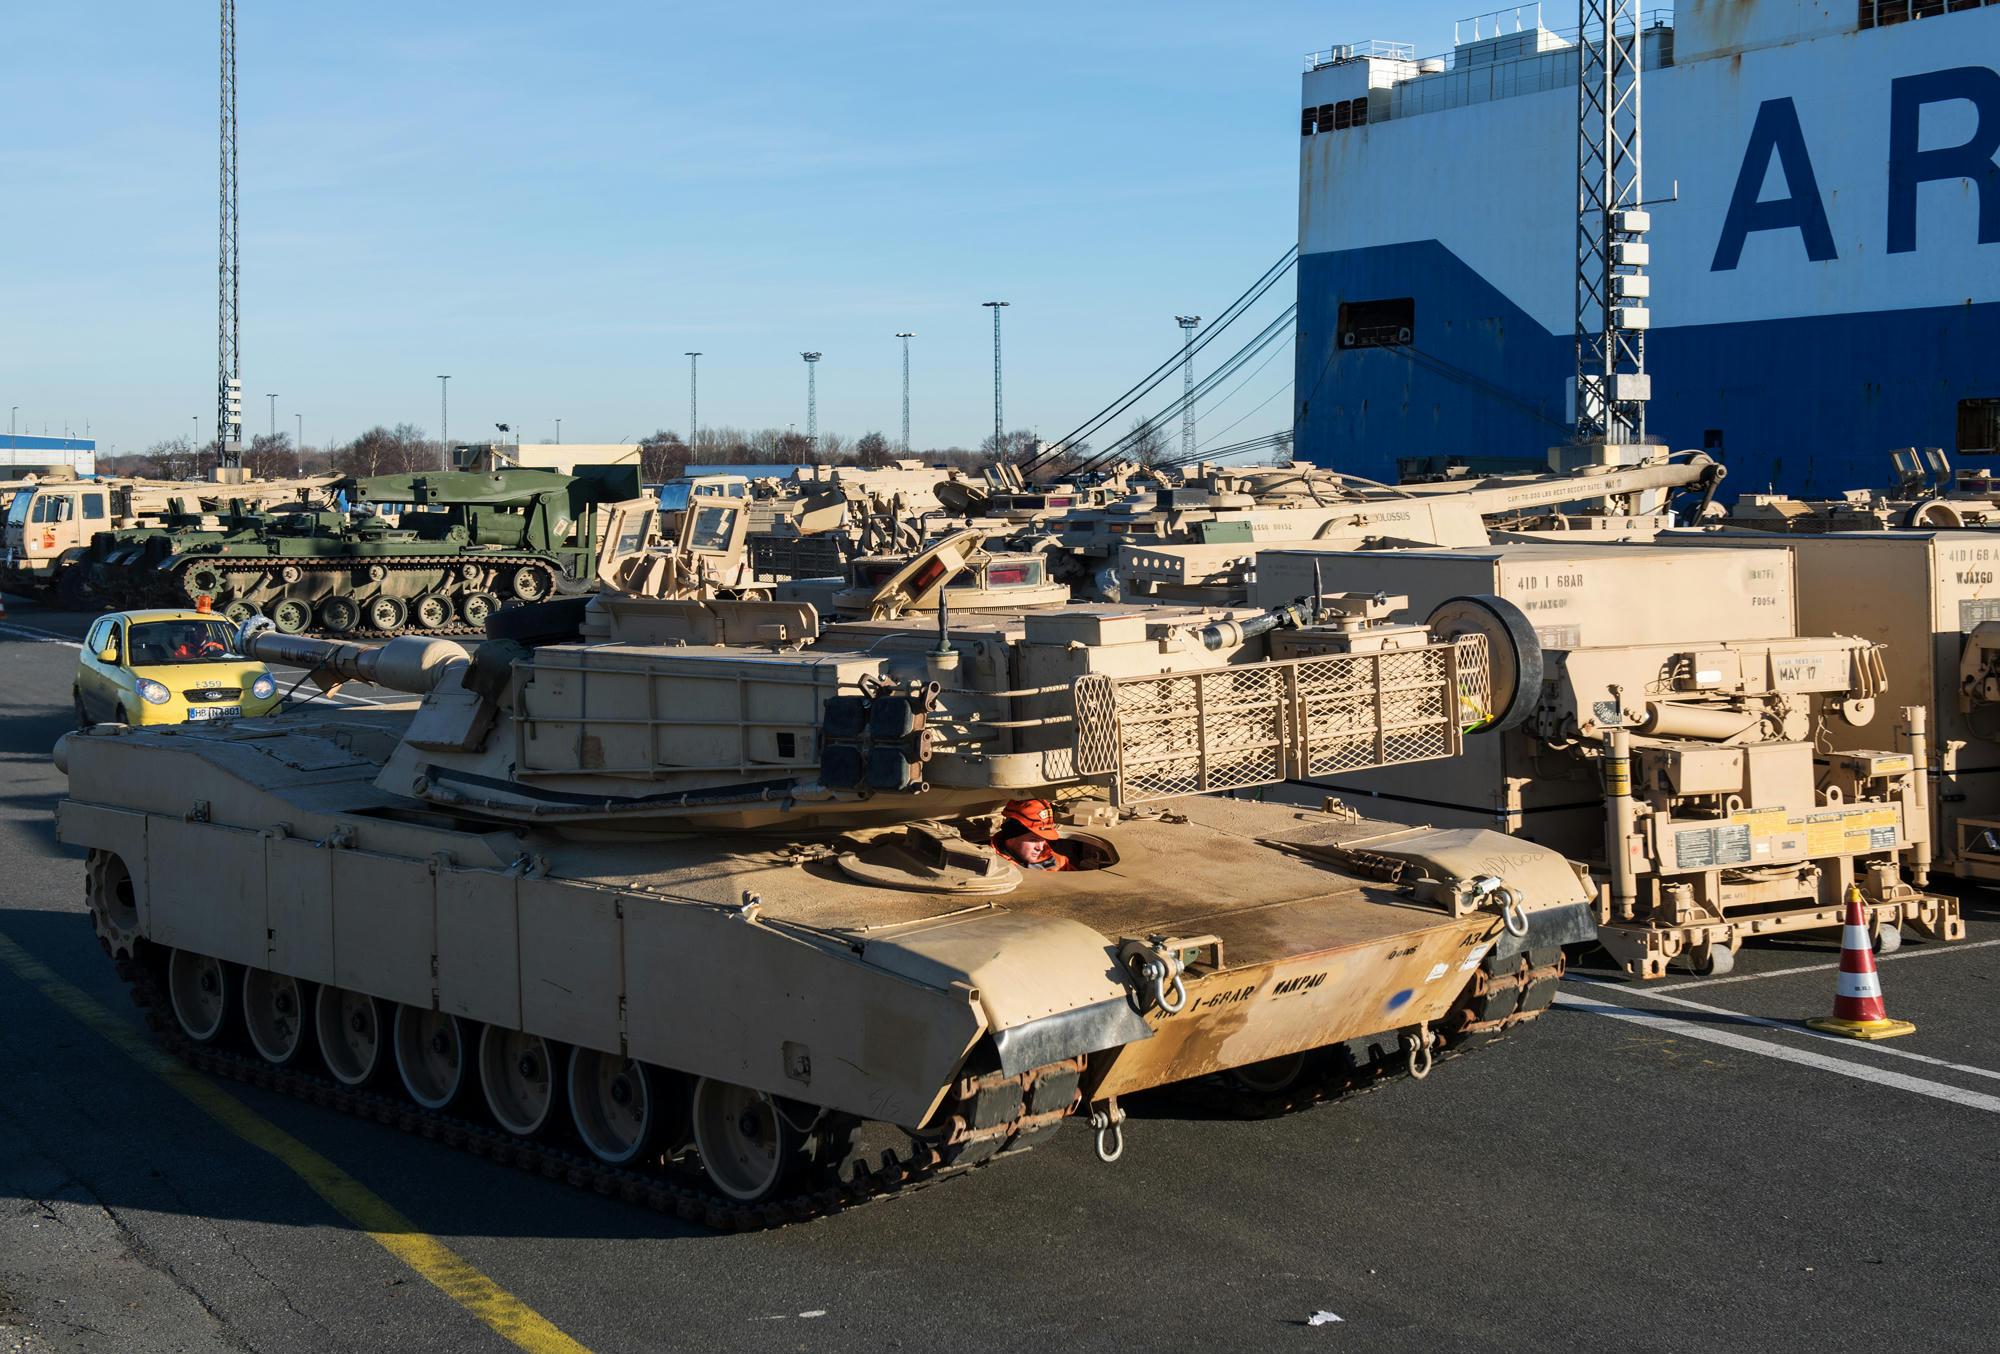 Orosz kolykok a magasban 496 - Amerikai Tankokat Pakolnak Ki N Metorsz Gban 2017 Janu R 6 N Az Ta M R Lengyelorsz Gba Vitt K Ket Photo Ingo Wagner Dpa